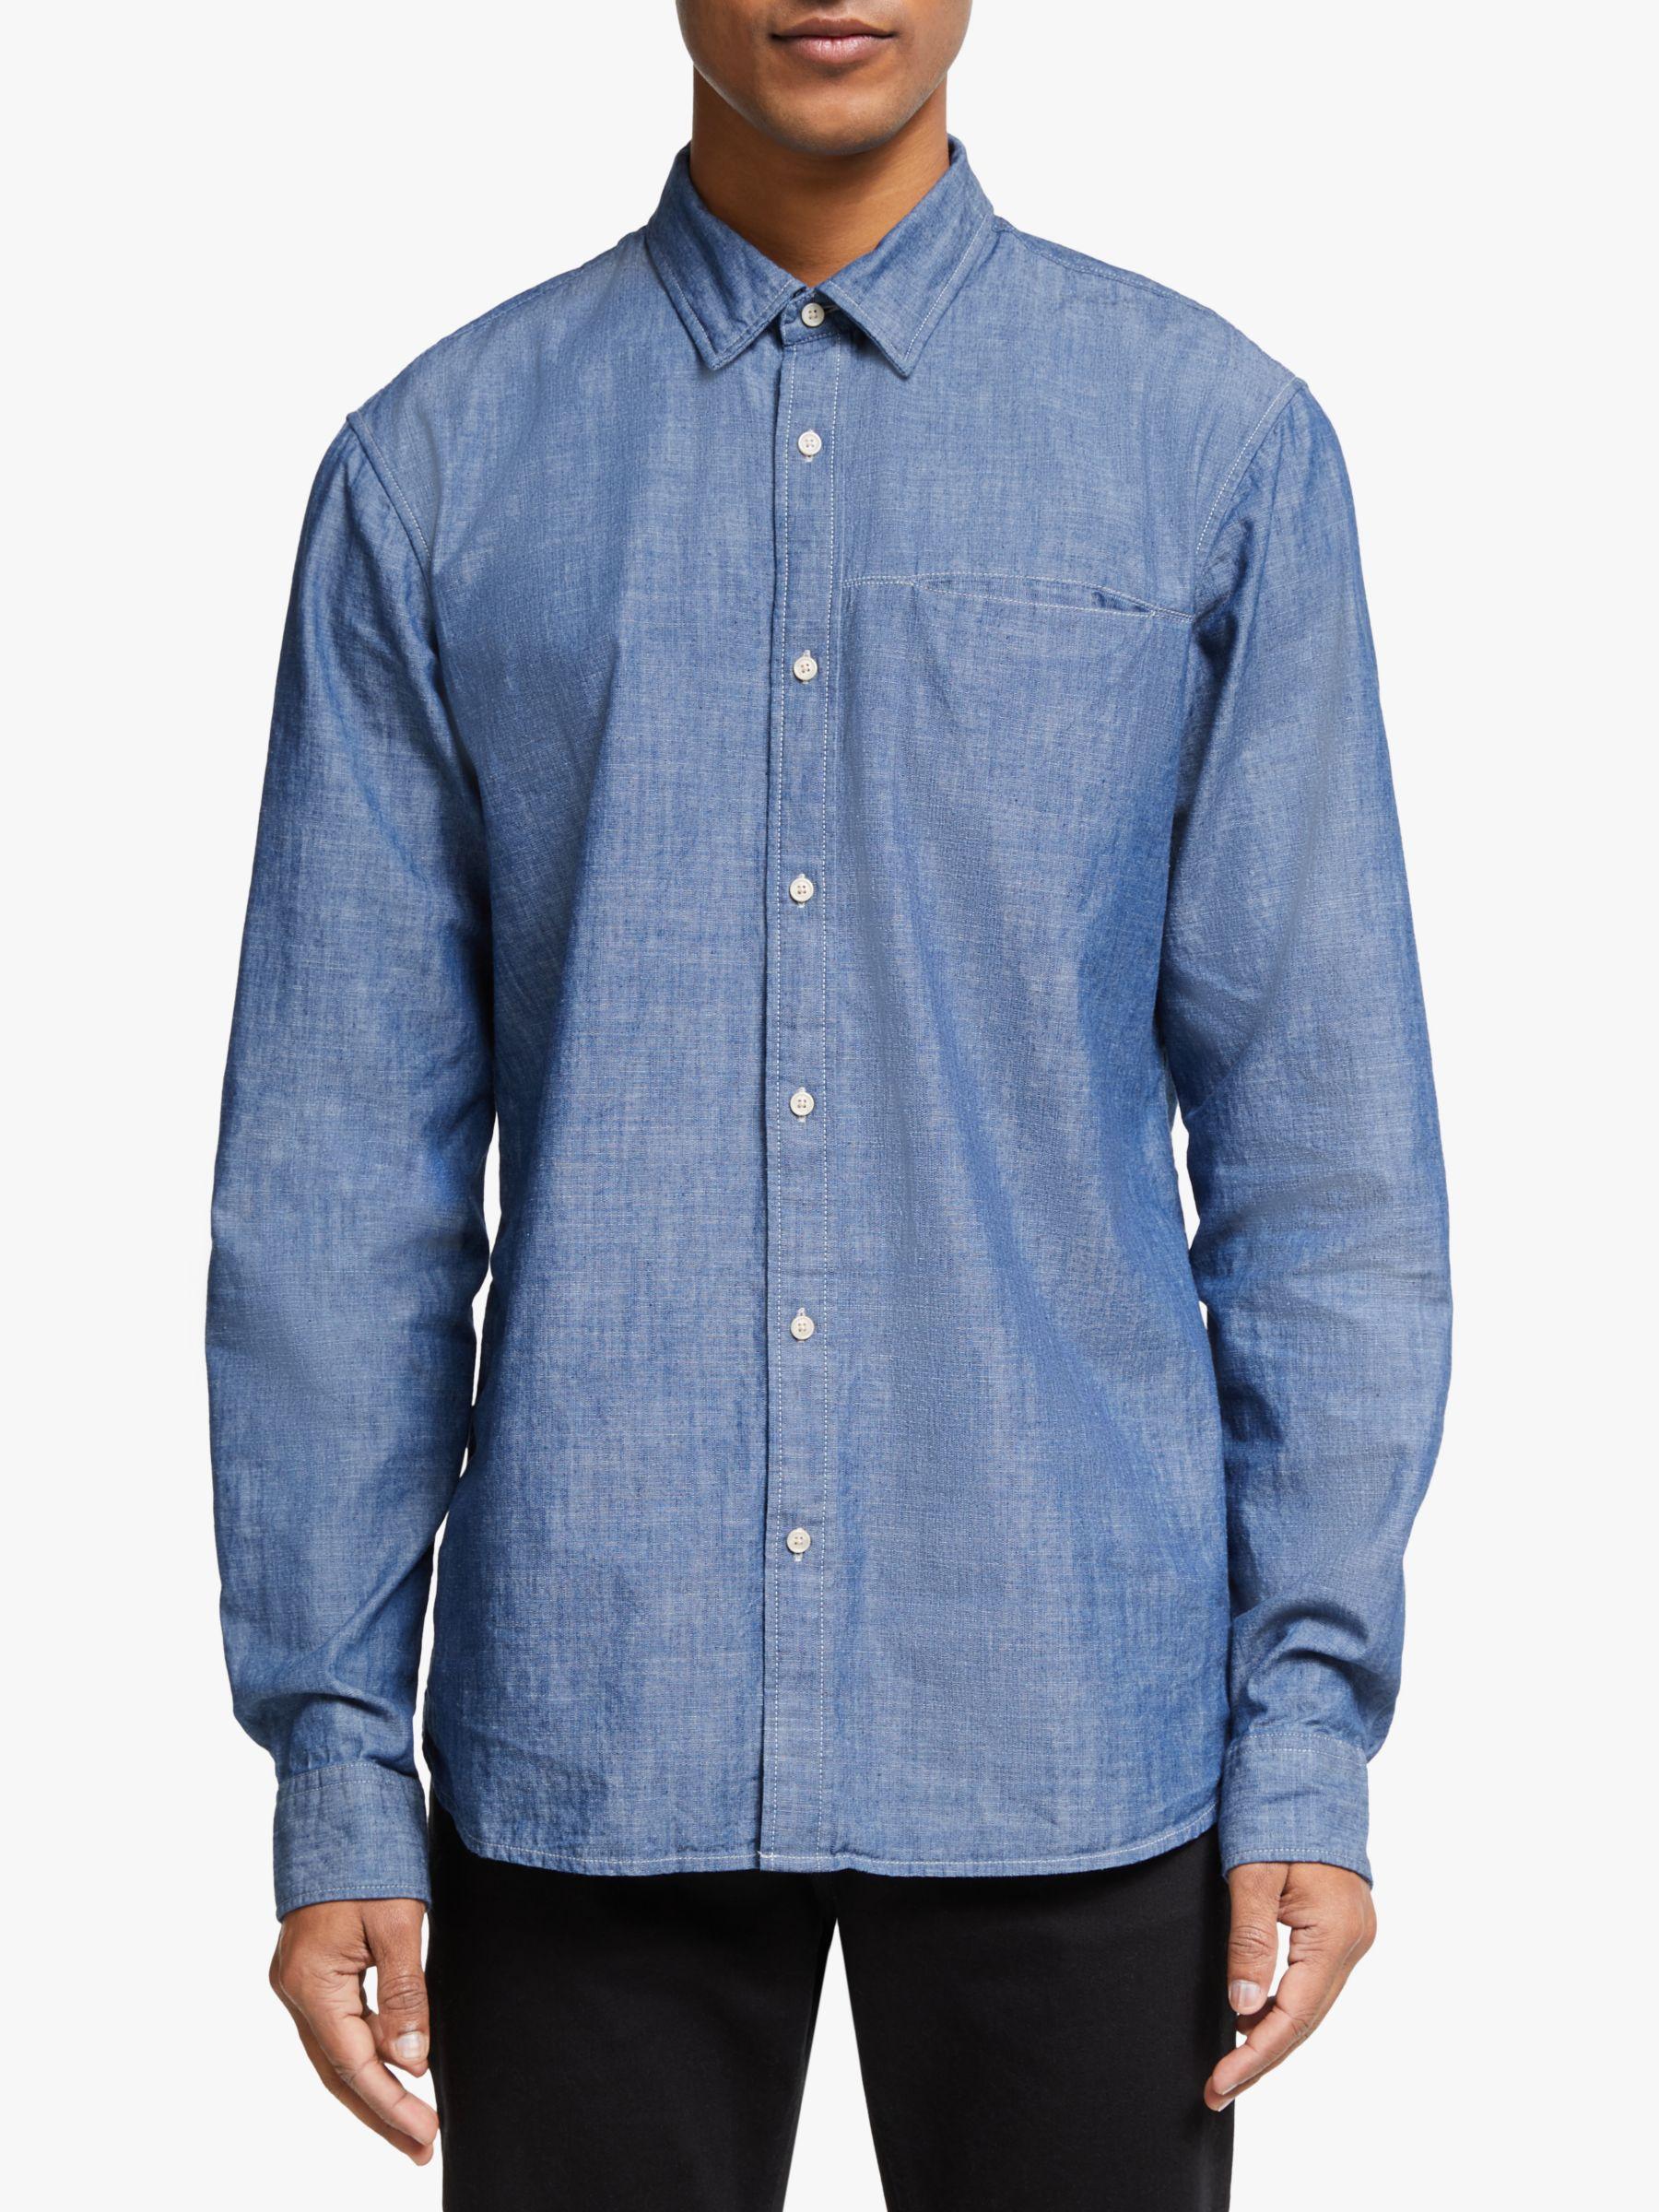 Scotch & Soda Scotch & Soda Cotton Shirt, Combo Blue